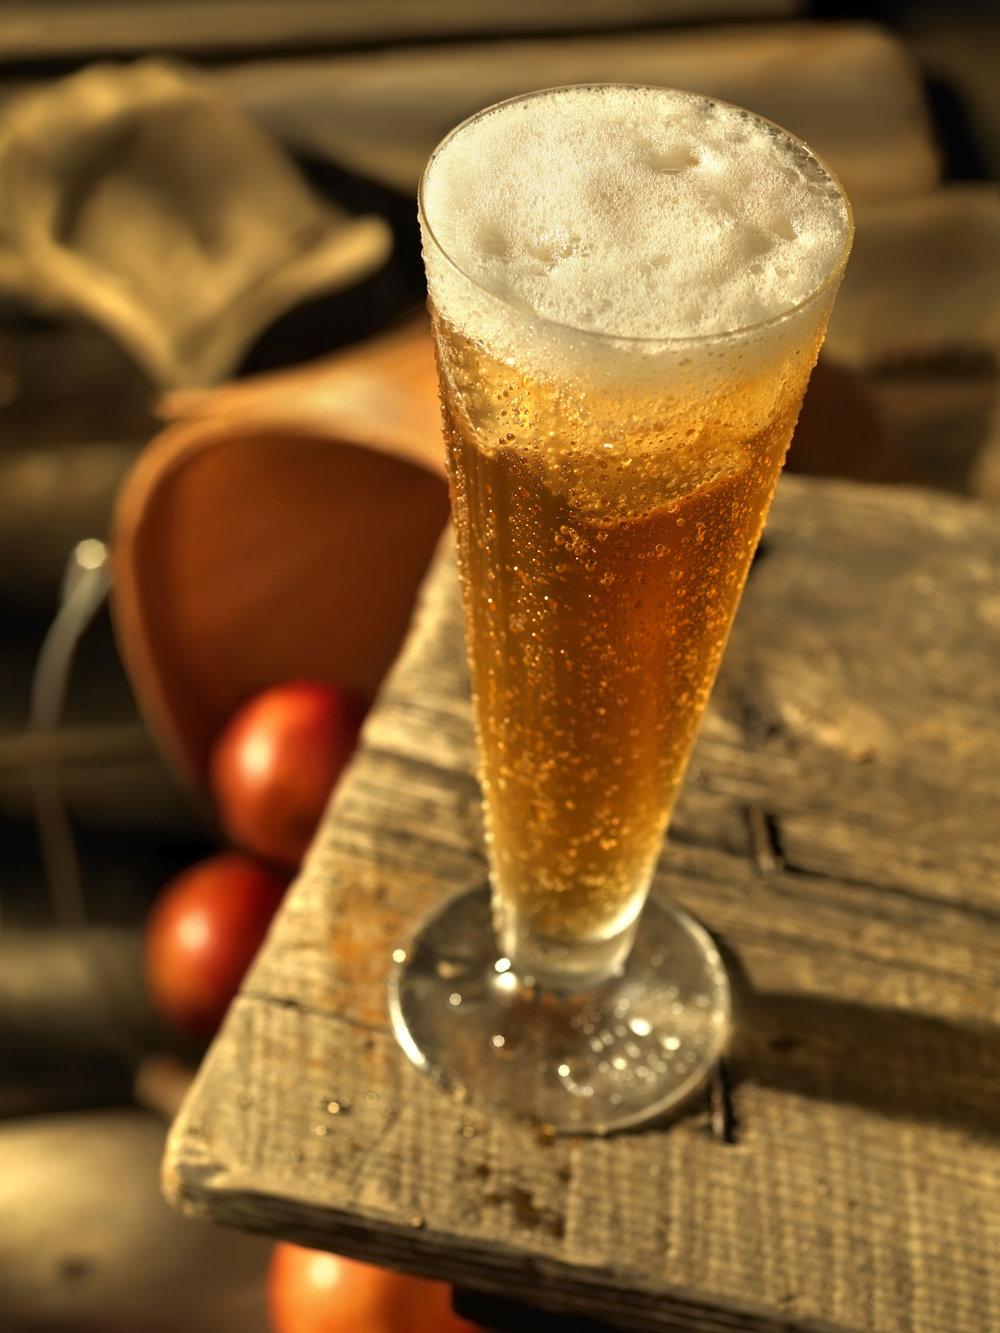 Apple-Cider-on-the-Porch-157428974_5412x7216.jpeg